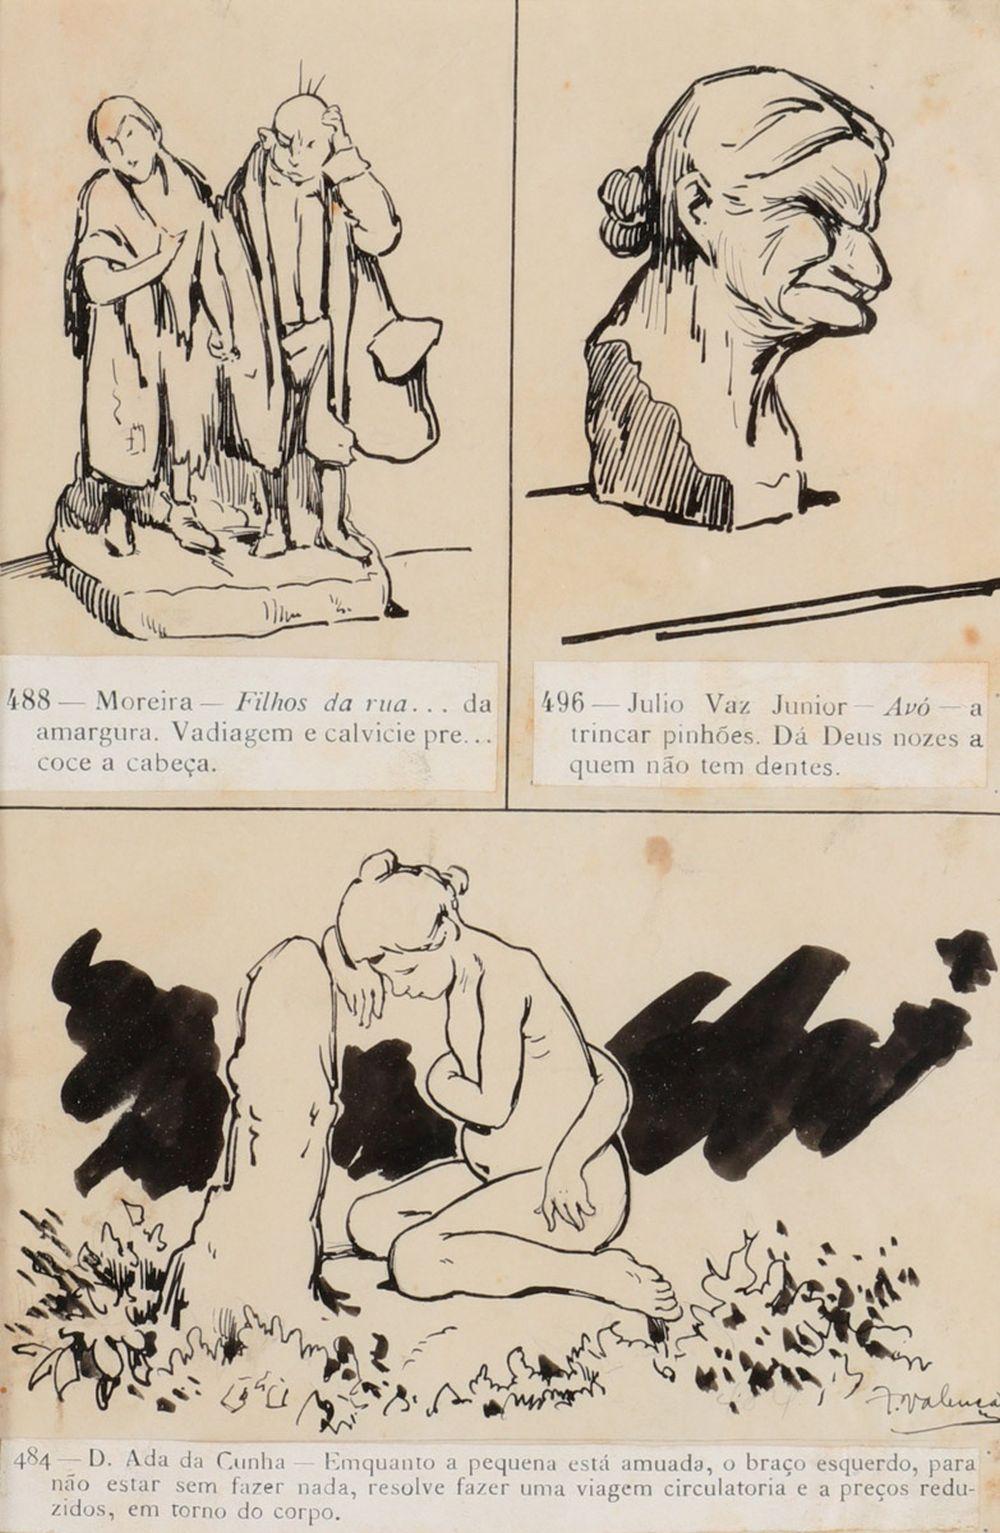 FRANCISCO VALENÇA (1882-1962), HUMOROUS SCENE